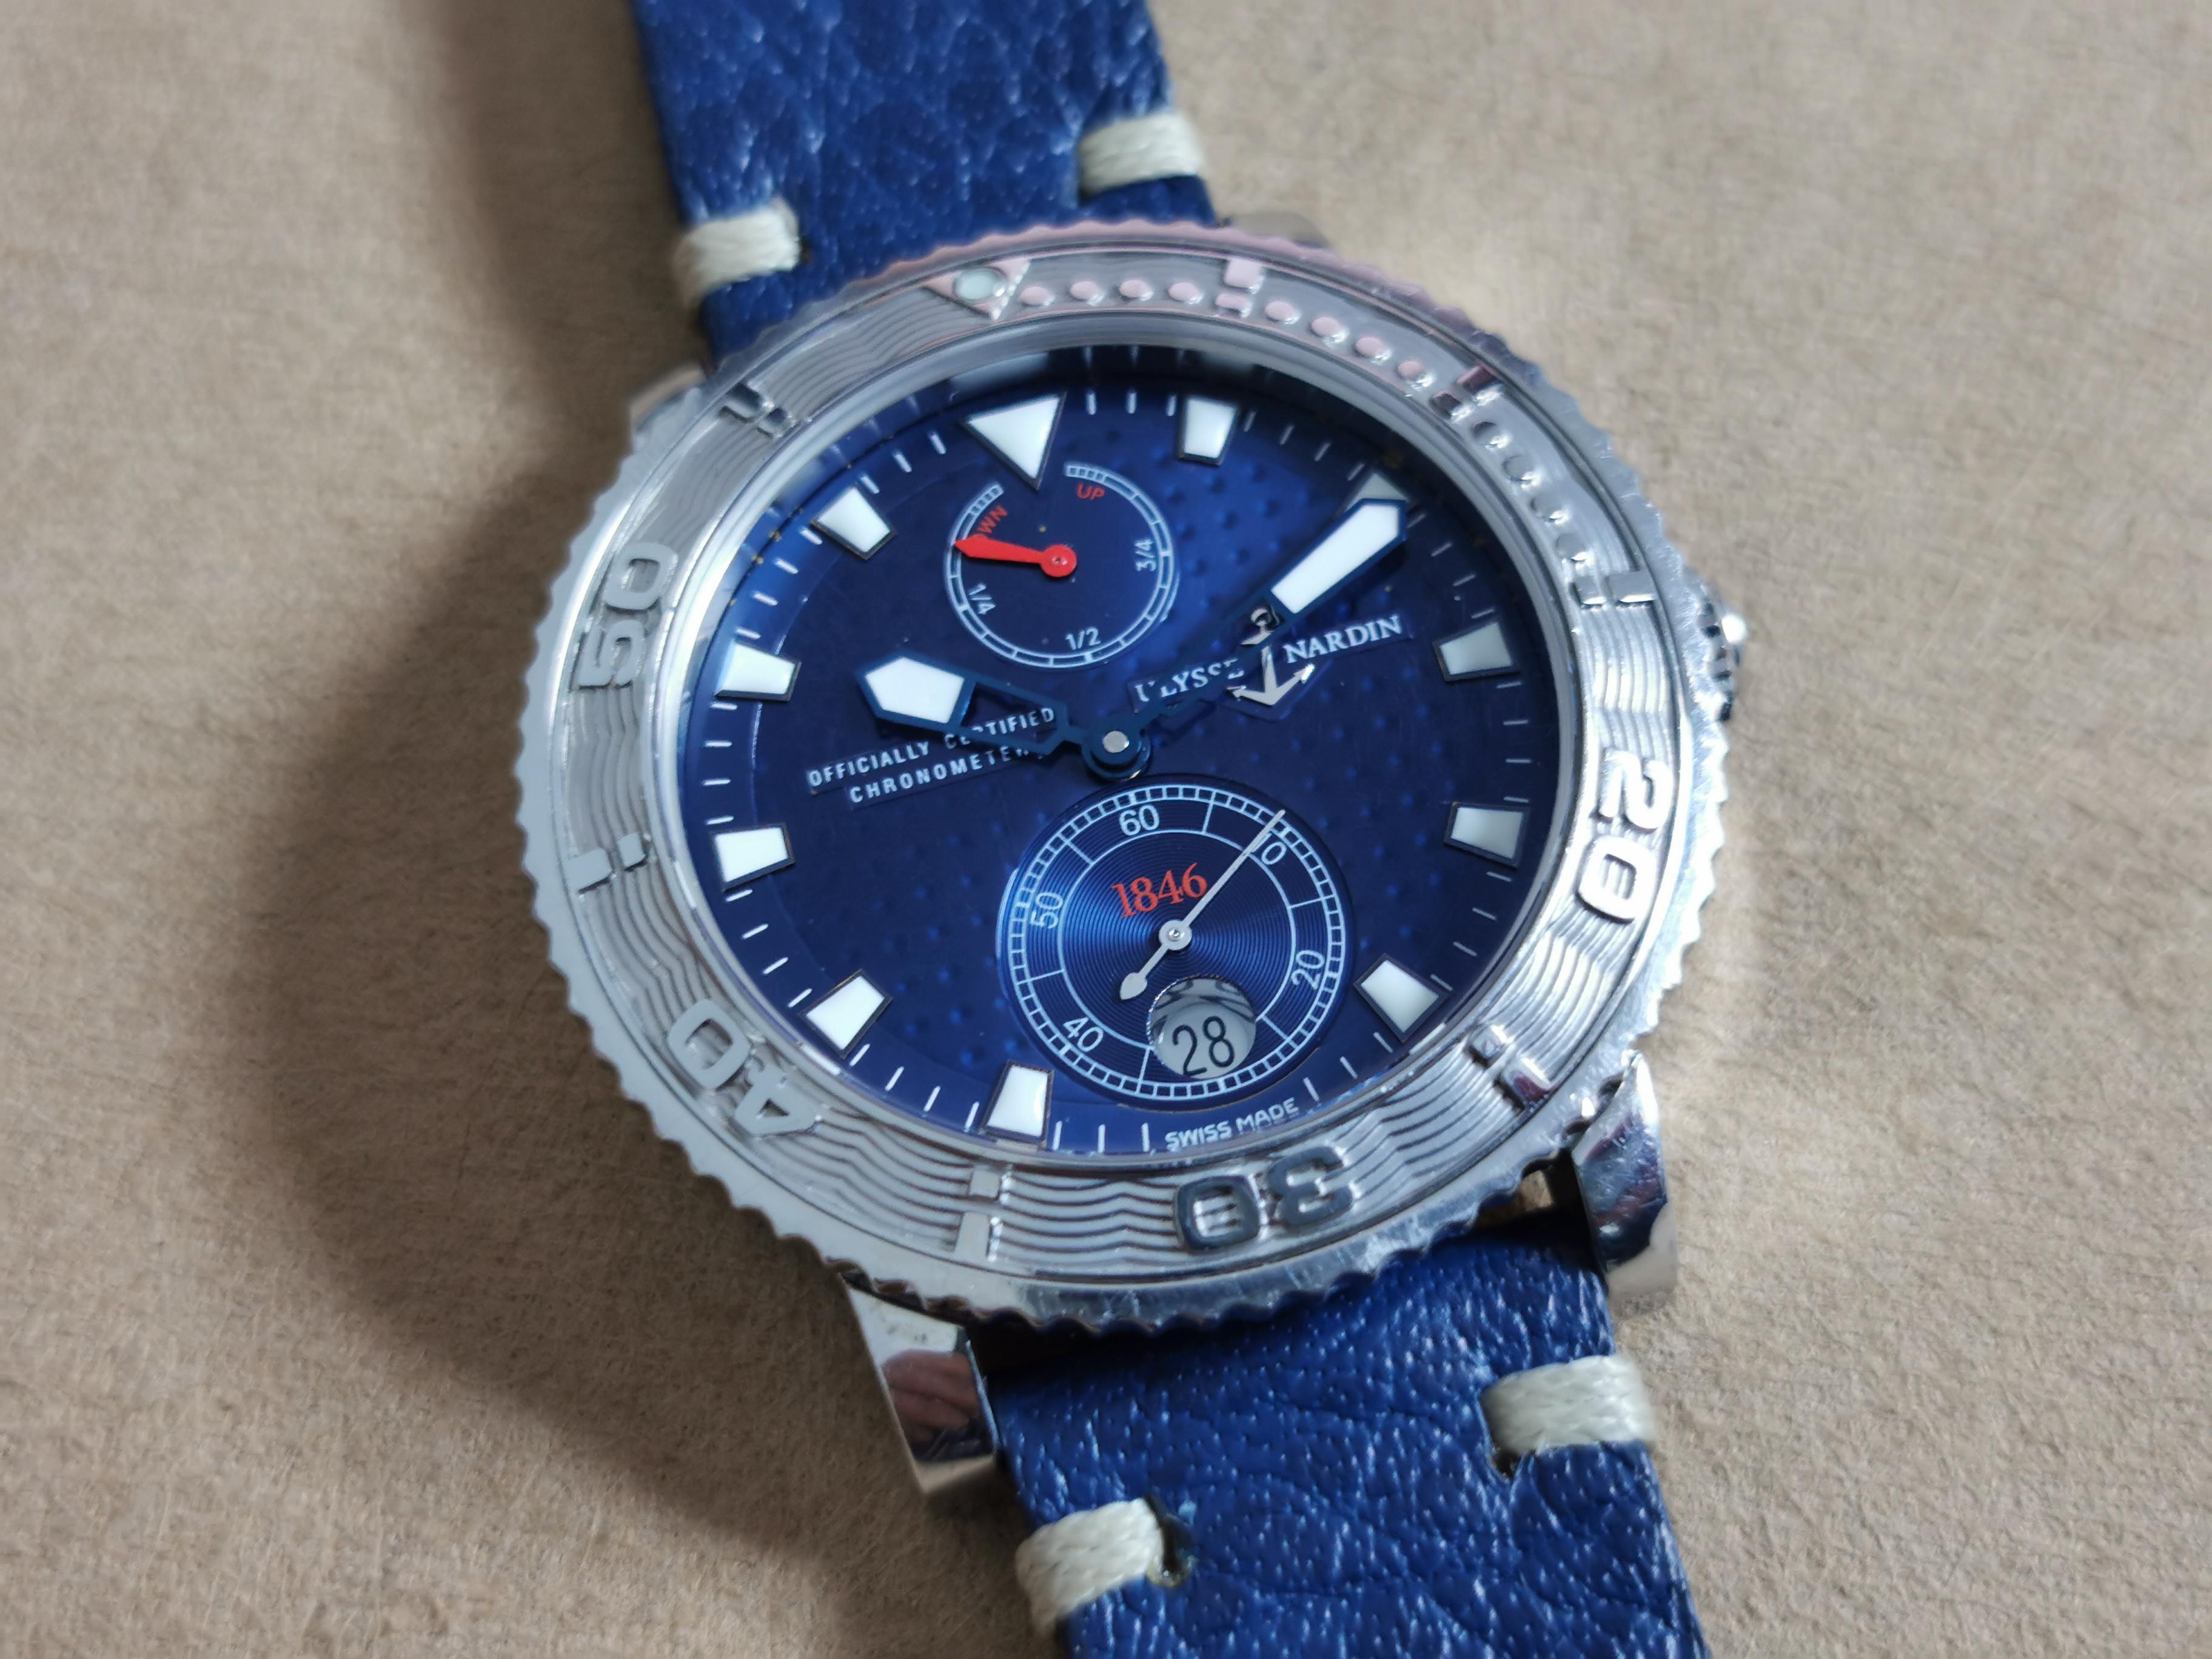 Ulysse Nardin Marine Chronometer 41mm Maxi Marine Ref. 263-58 Limited Edition N. 419/999 Blu Dial Steel 41 Mm | San Giorgio a Cremano